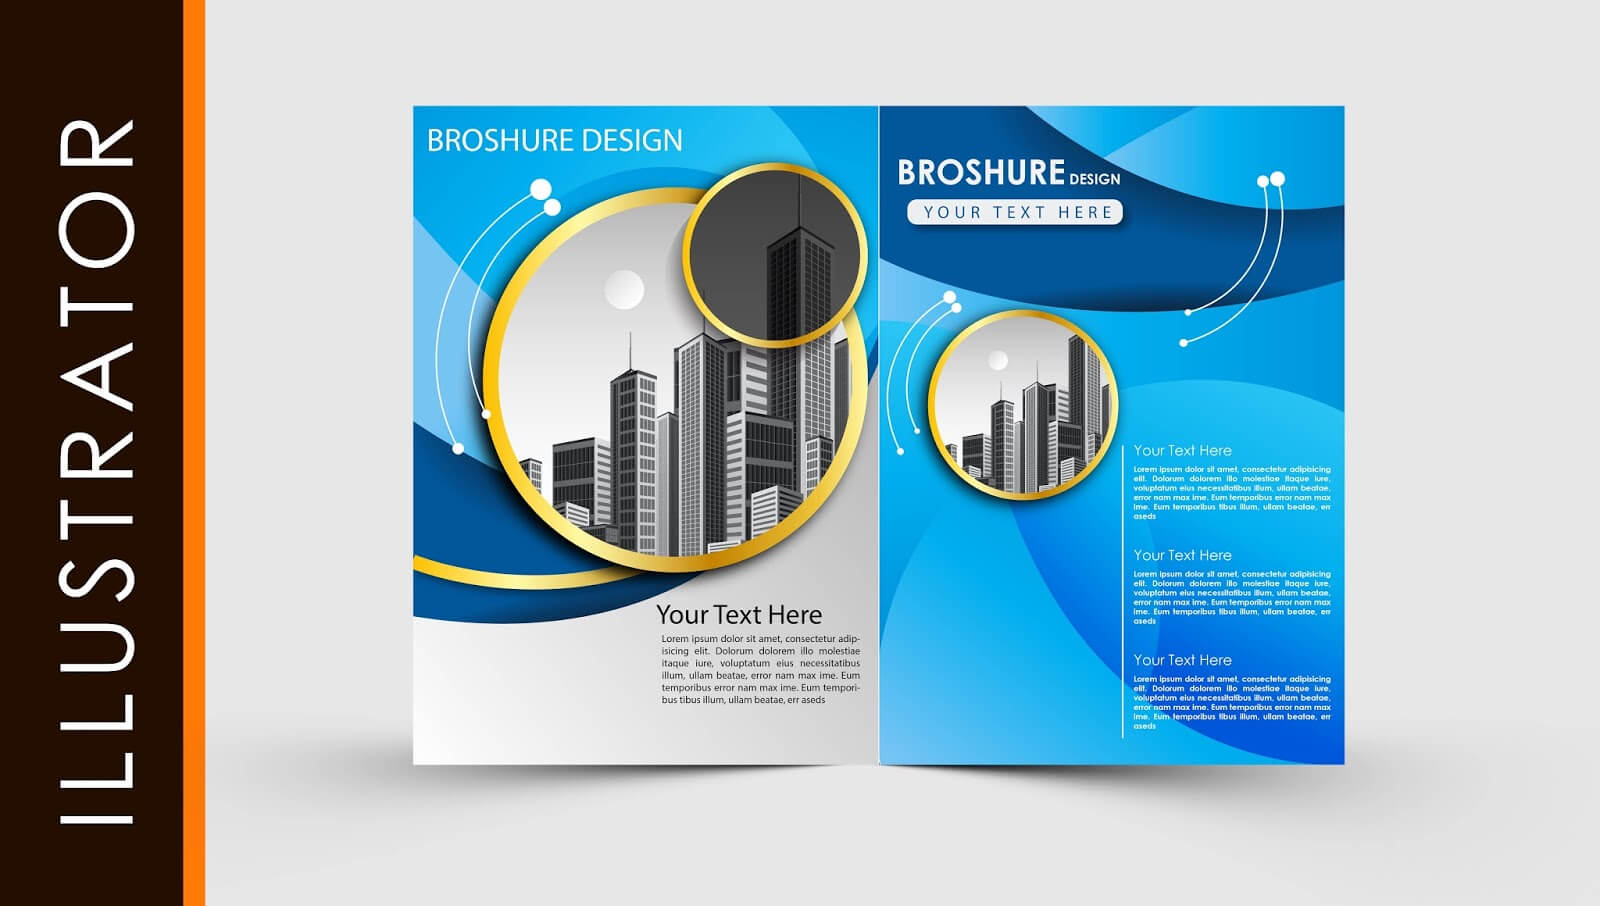 Free Download Adobe Illustrator Template Brochure Two Fold For Adobe Illustrator Brochure Templates Free Download